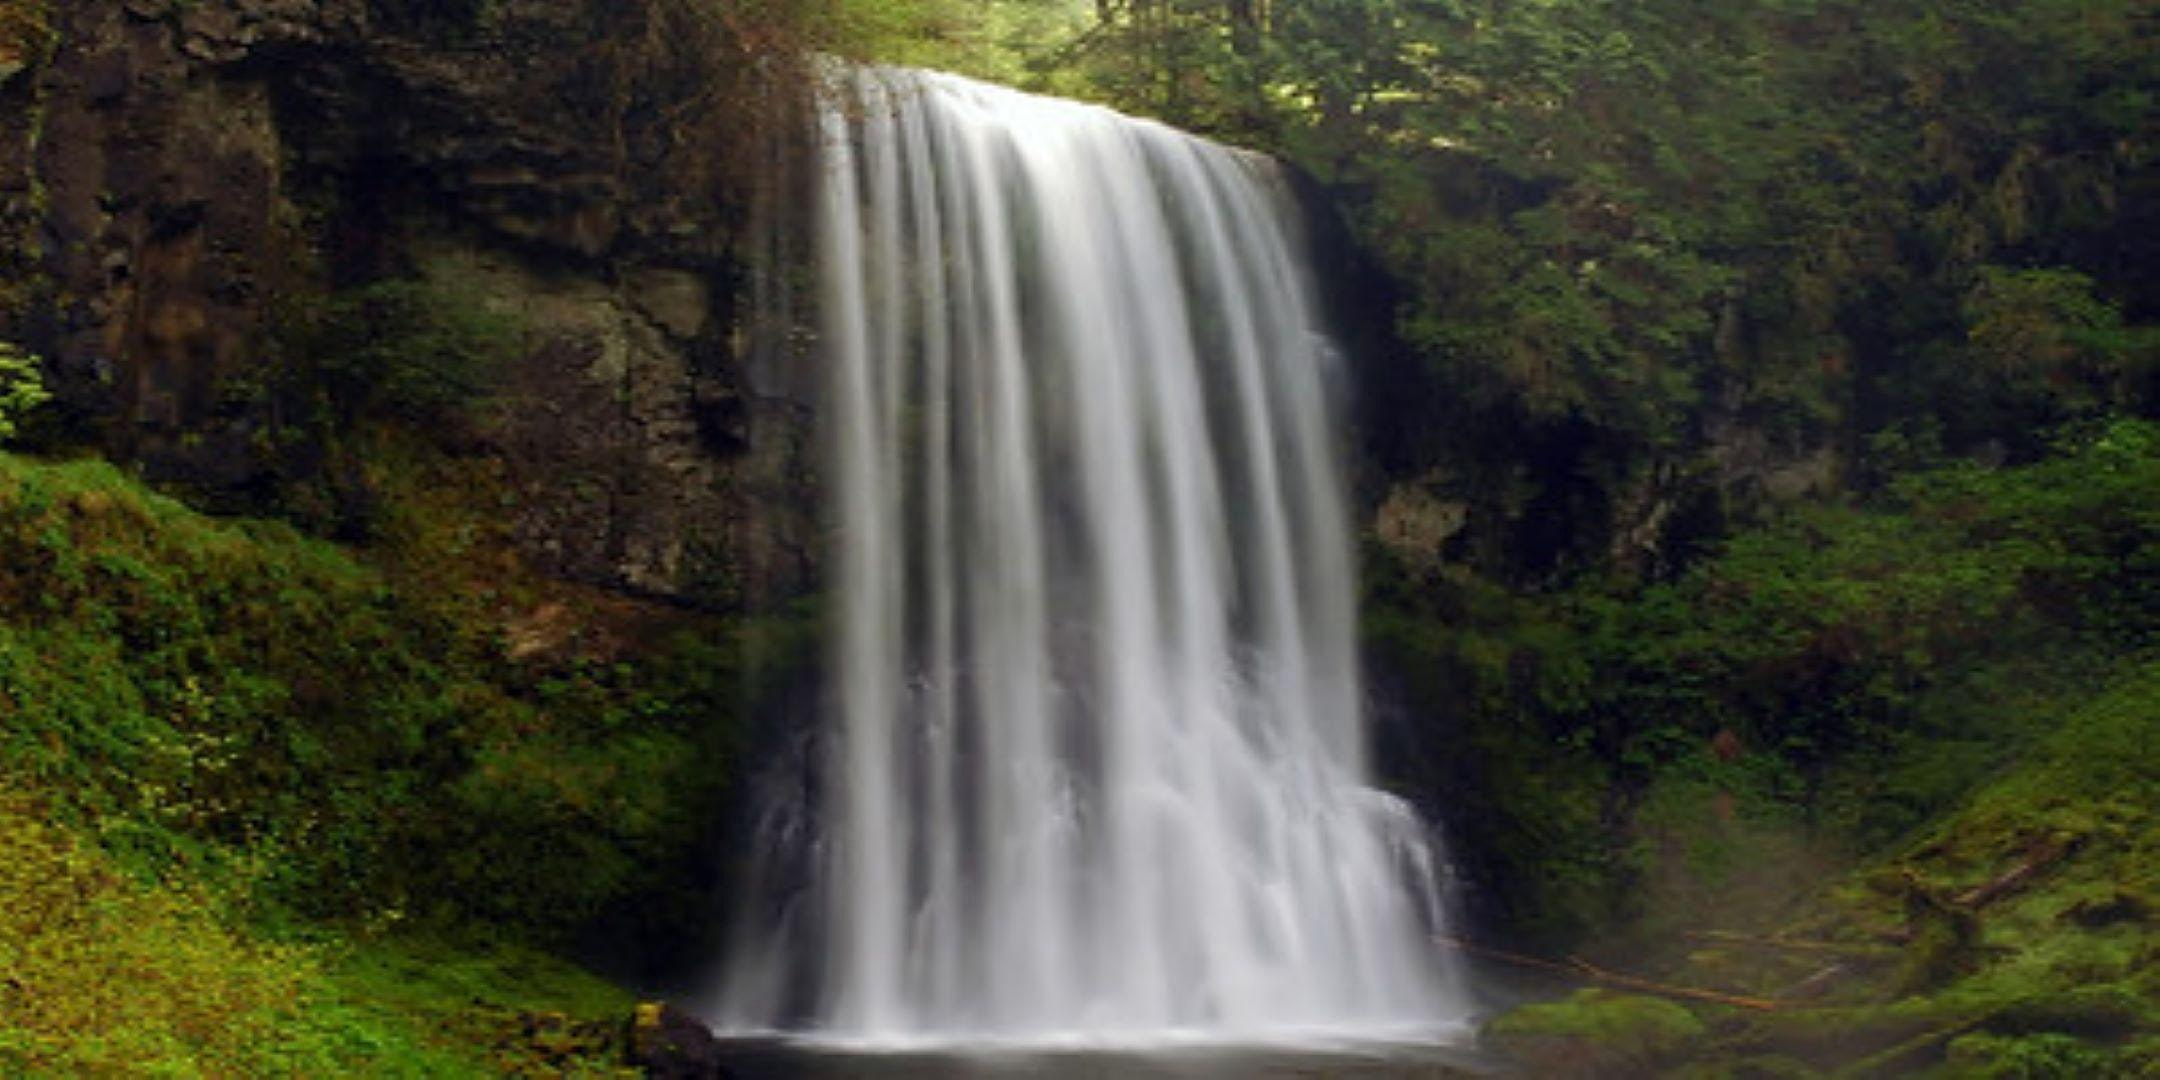 CANCELLED: Bridal Veil Falls Hidden History Walk, OR